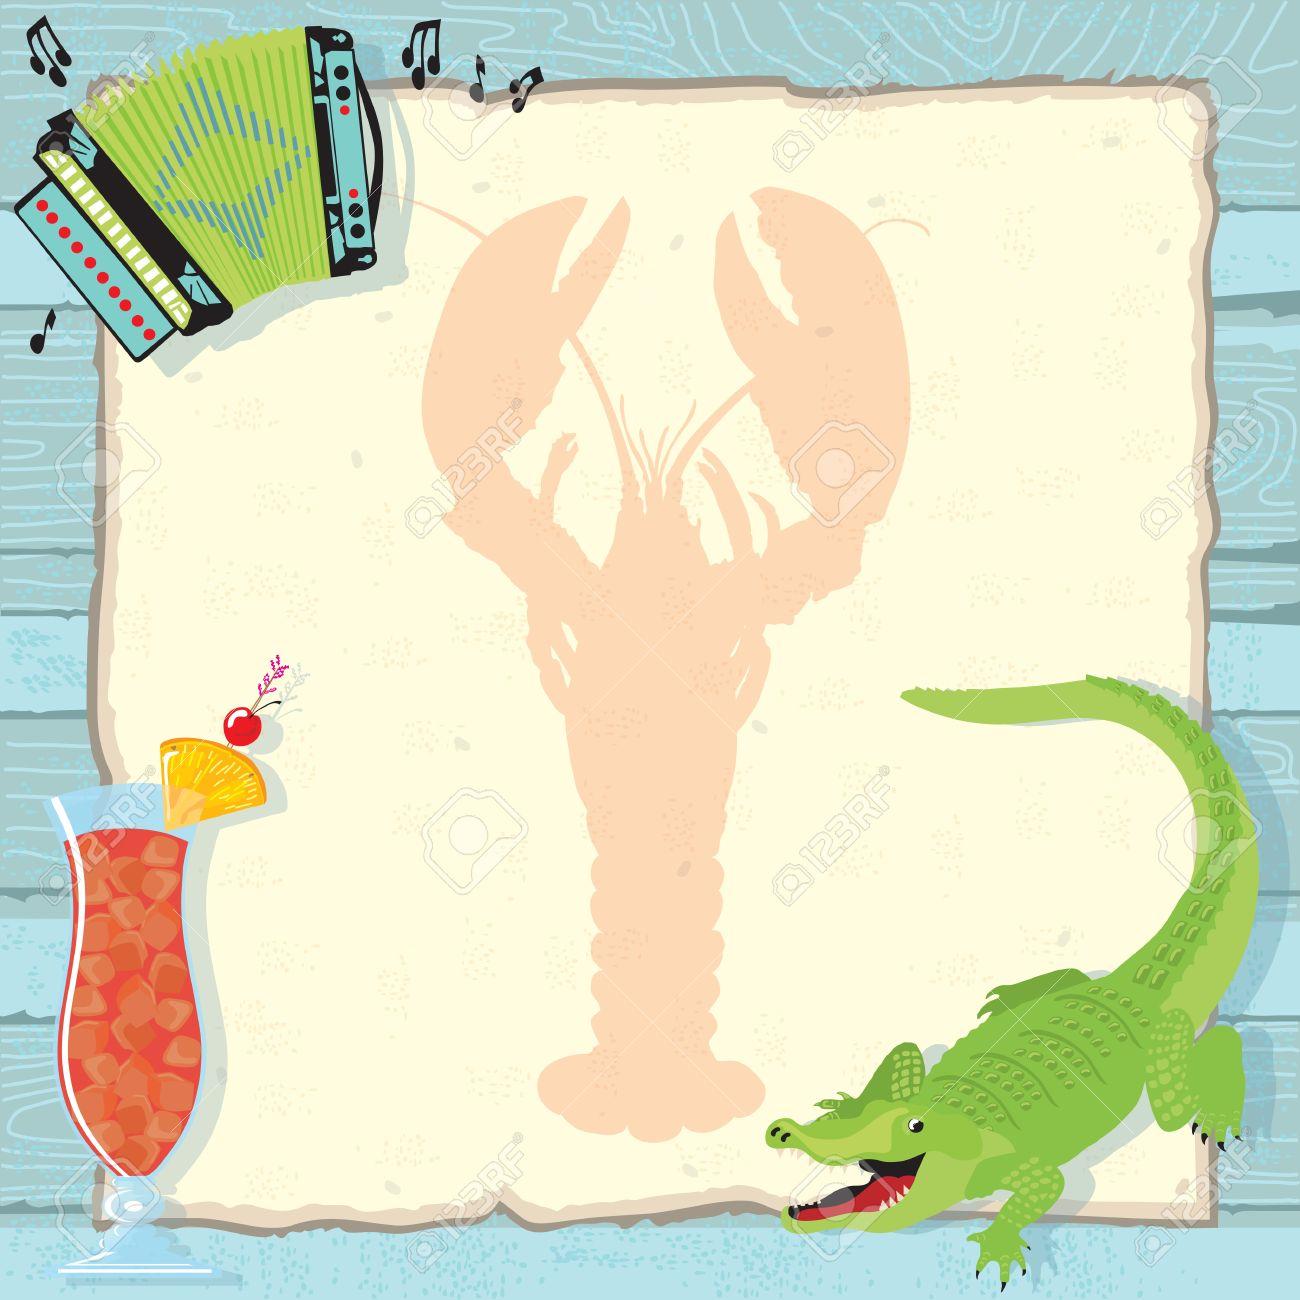 Fun Cajun lobster boil party invitation with accordion, alligator,...